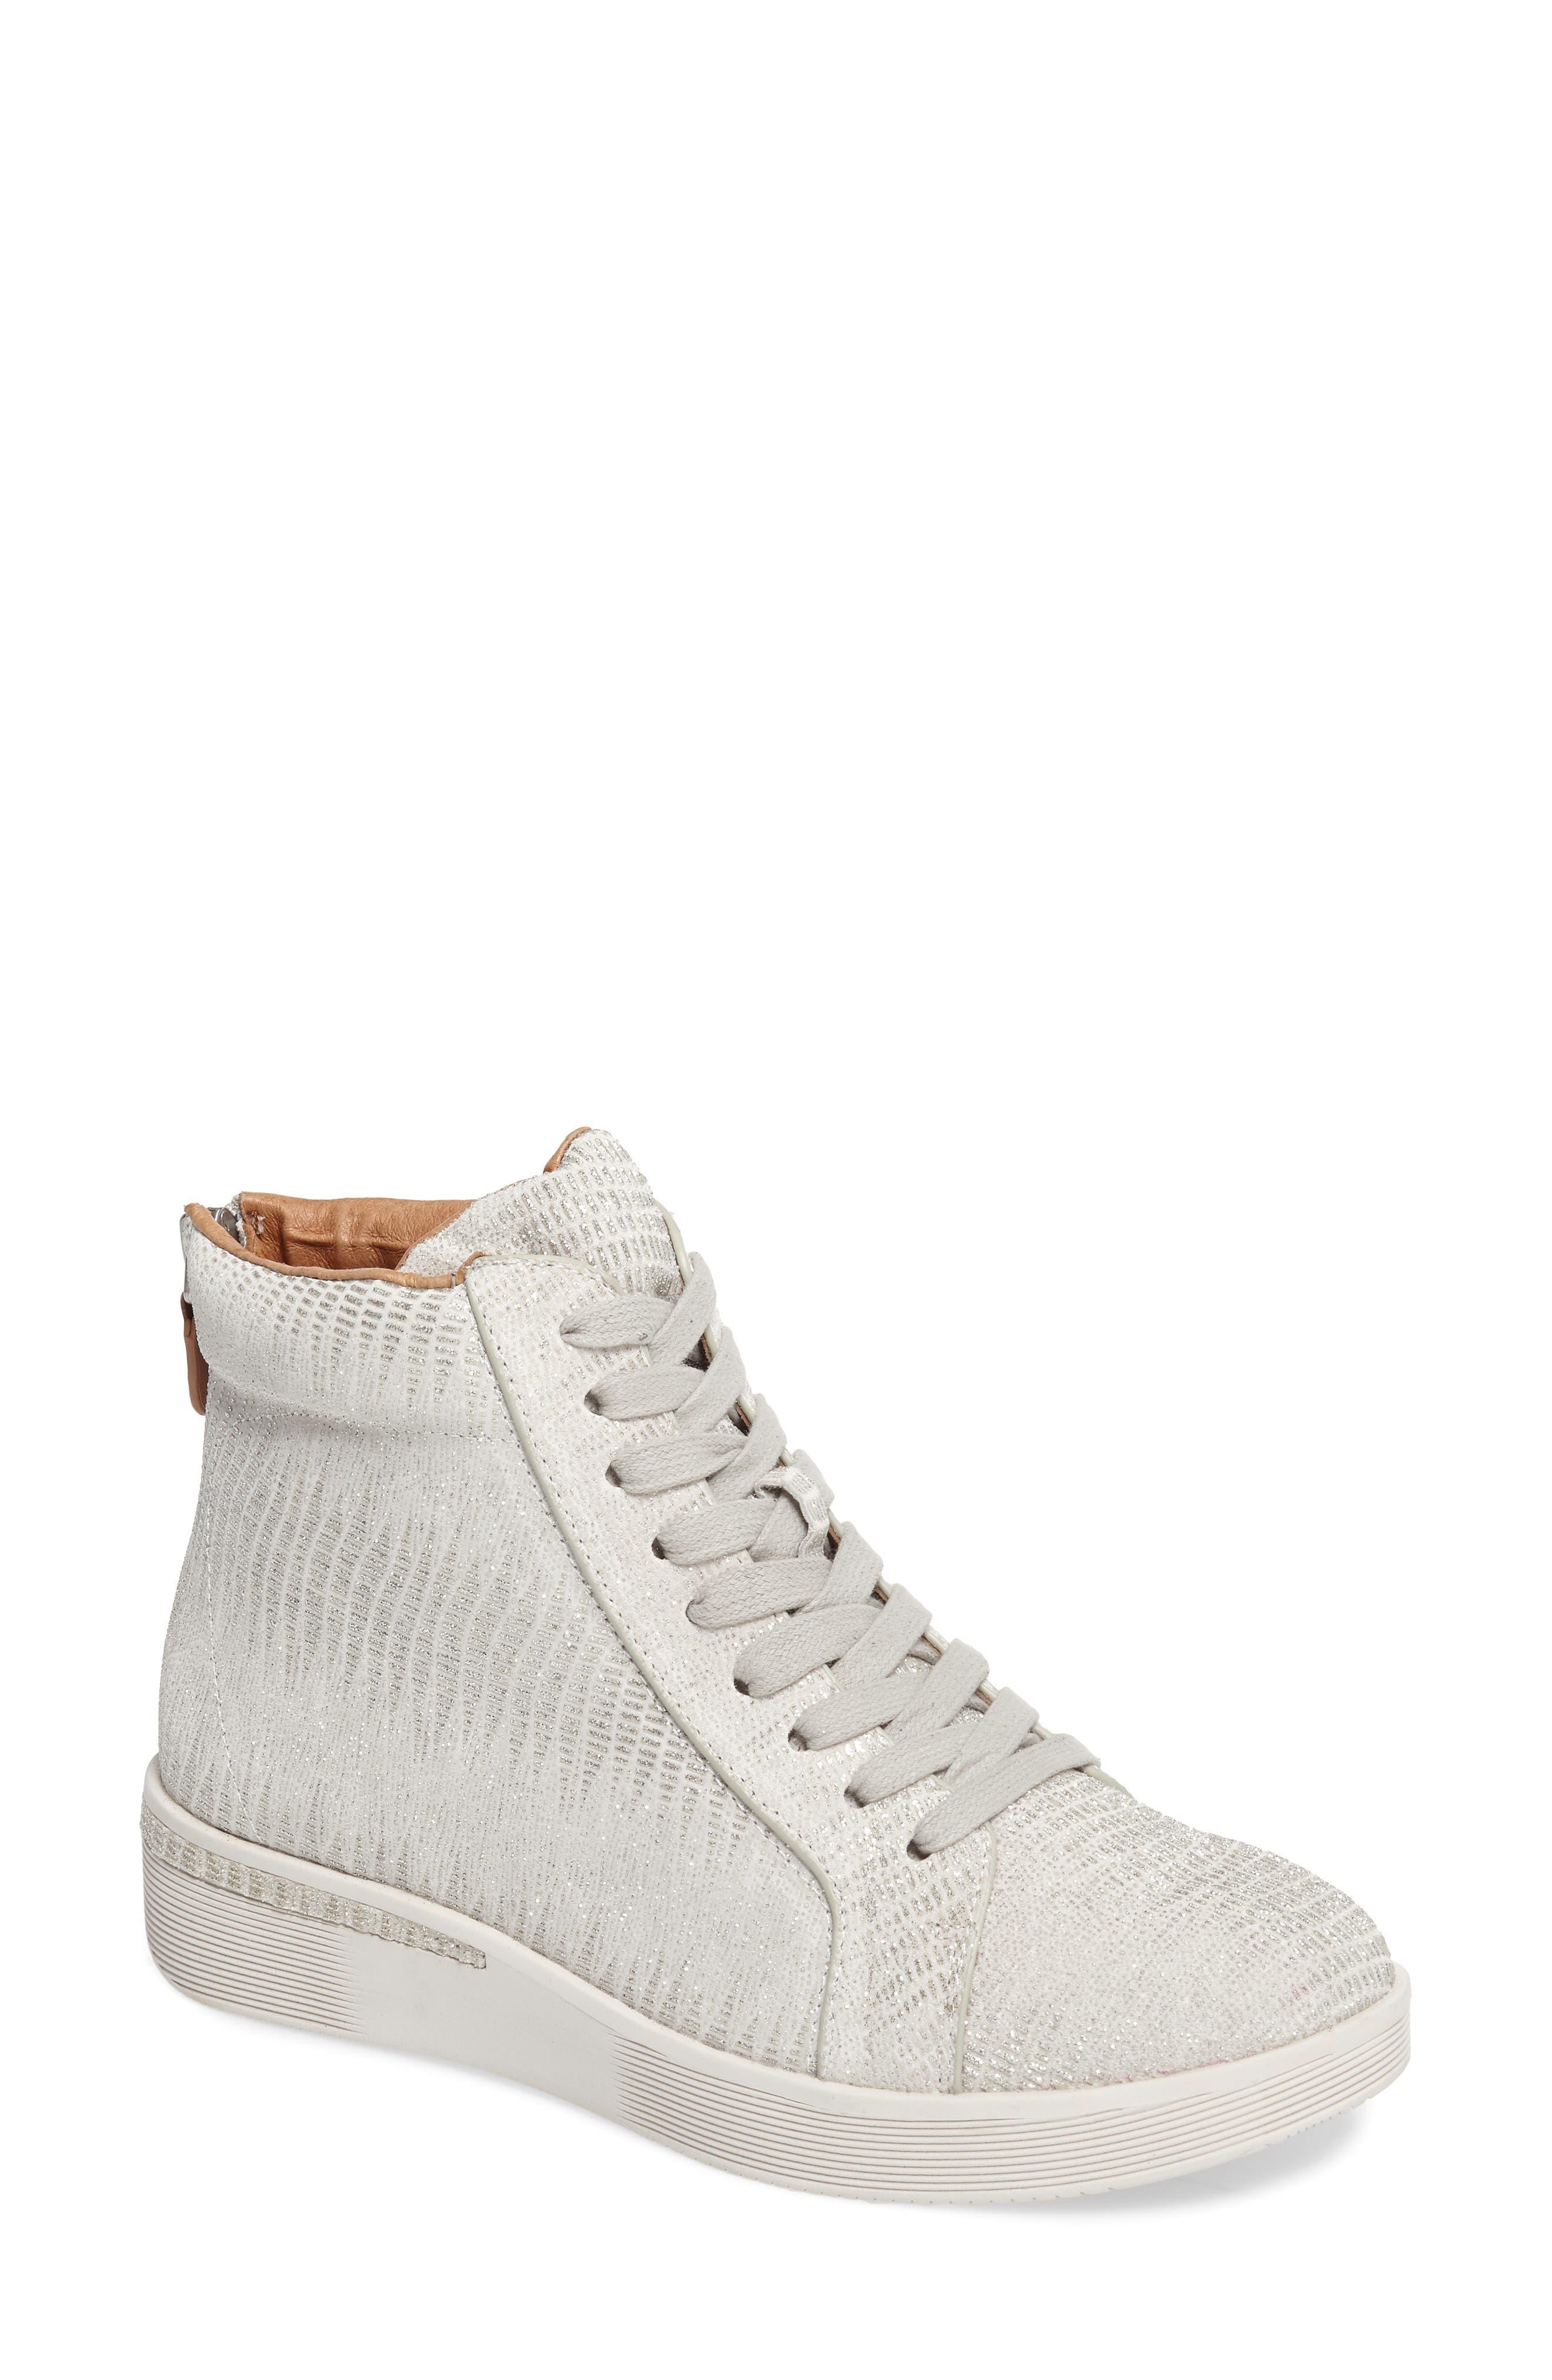 Helka High Top Sneaker,                             Main thumbnail 2, color,